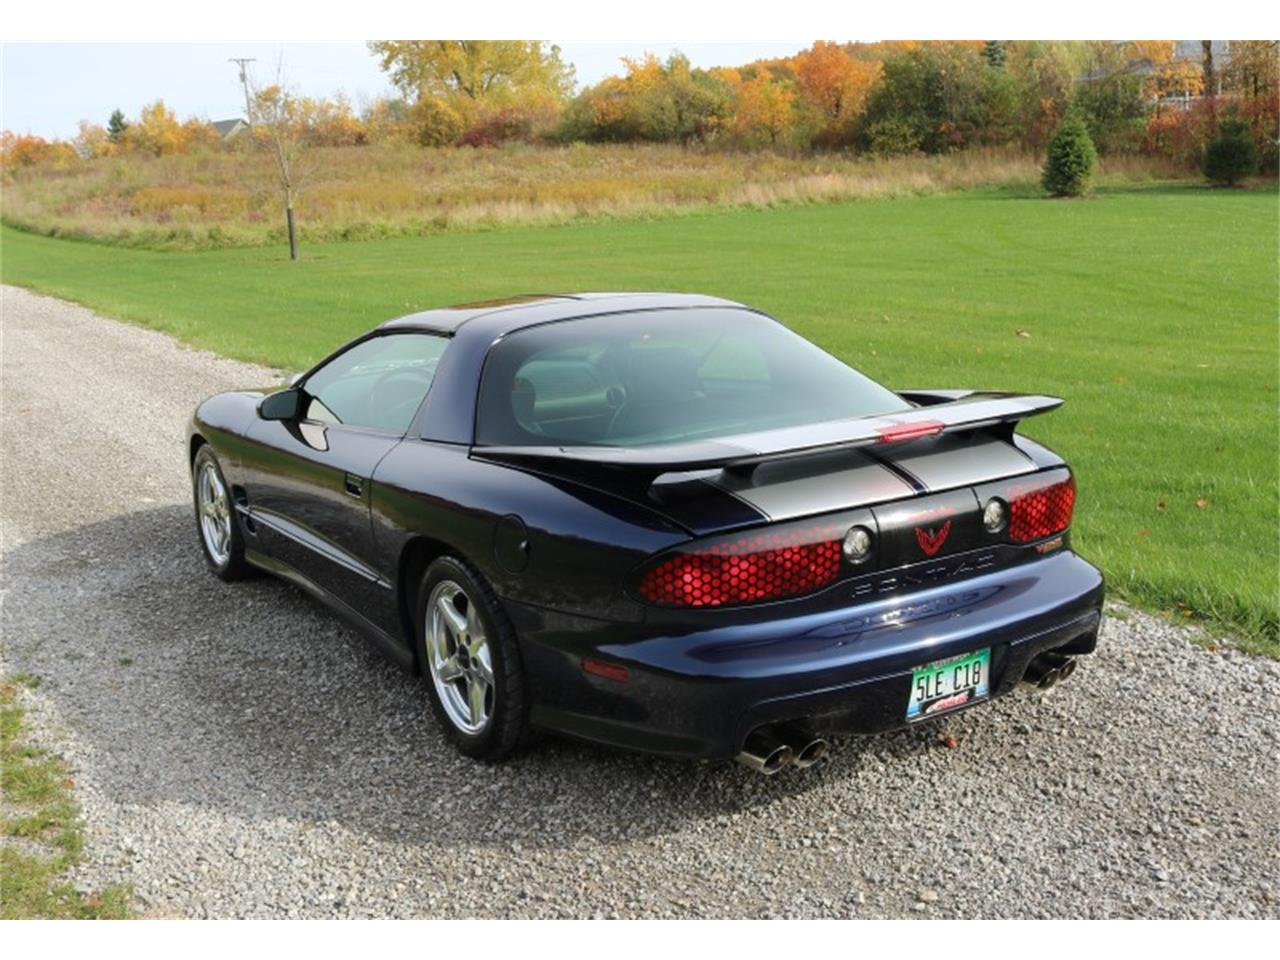 2002 Pontiac Firebird Trans Am WS6 (CC-1415234) for sale in Ortonville, Michigan